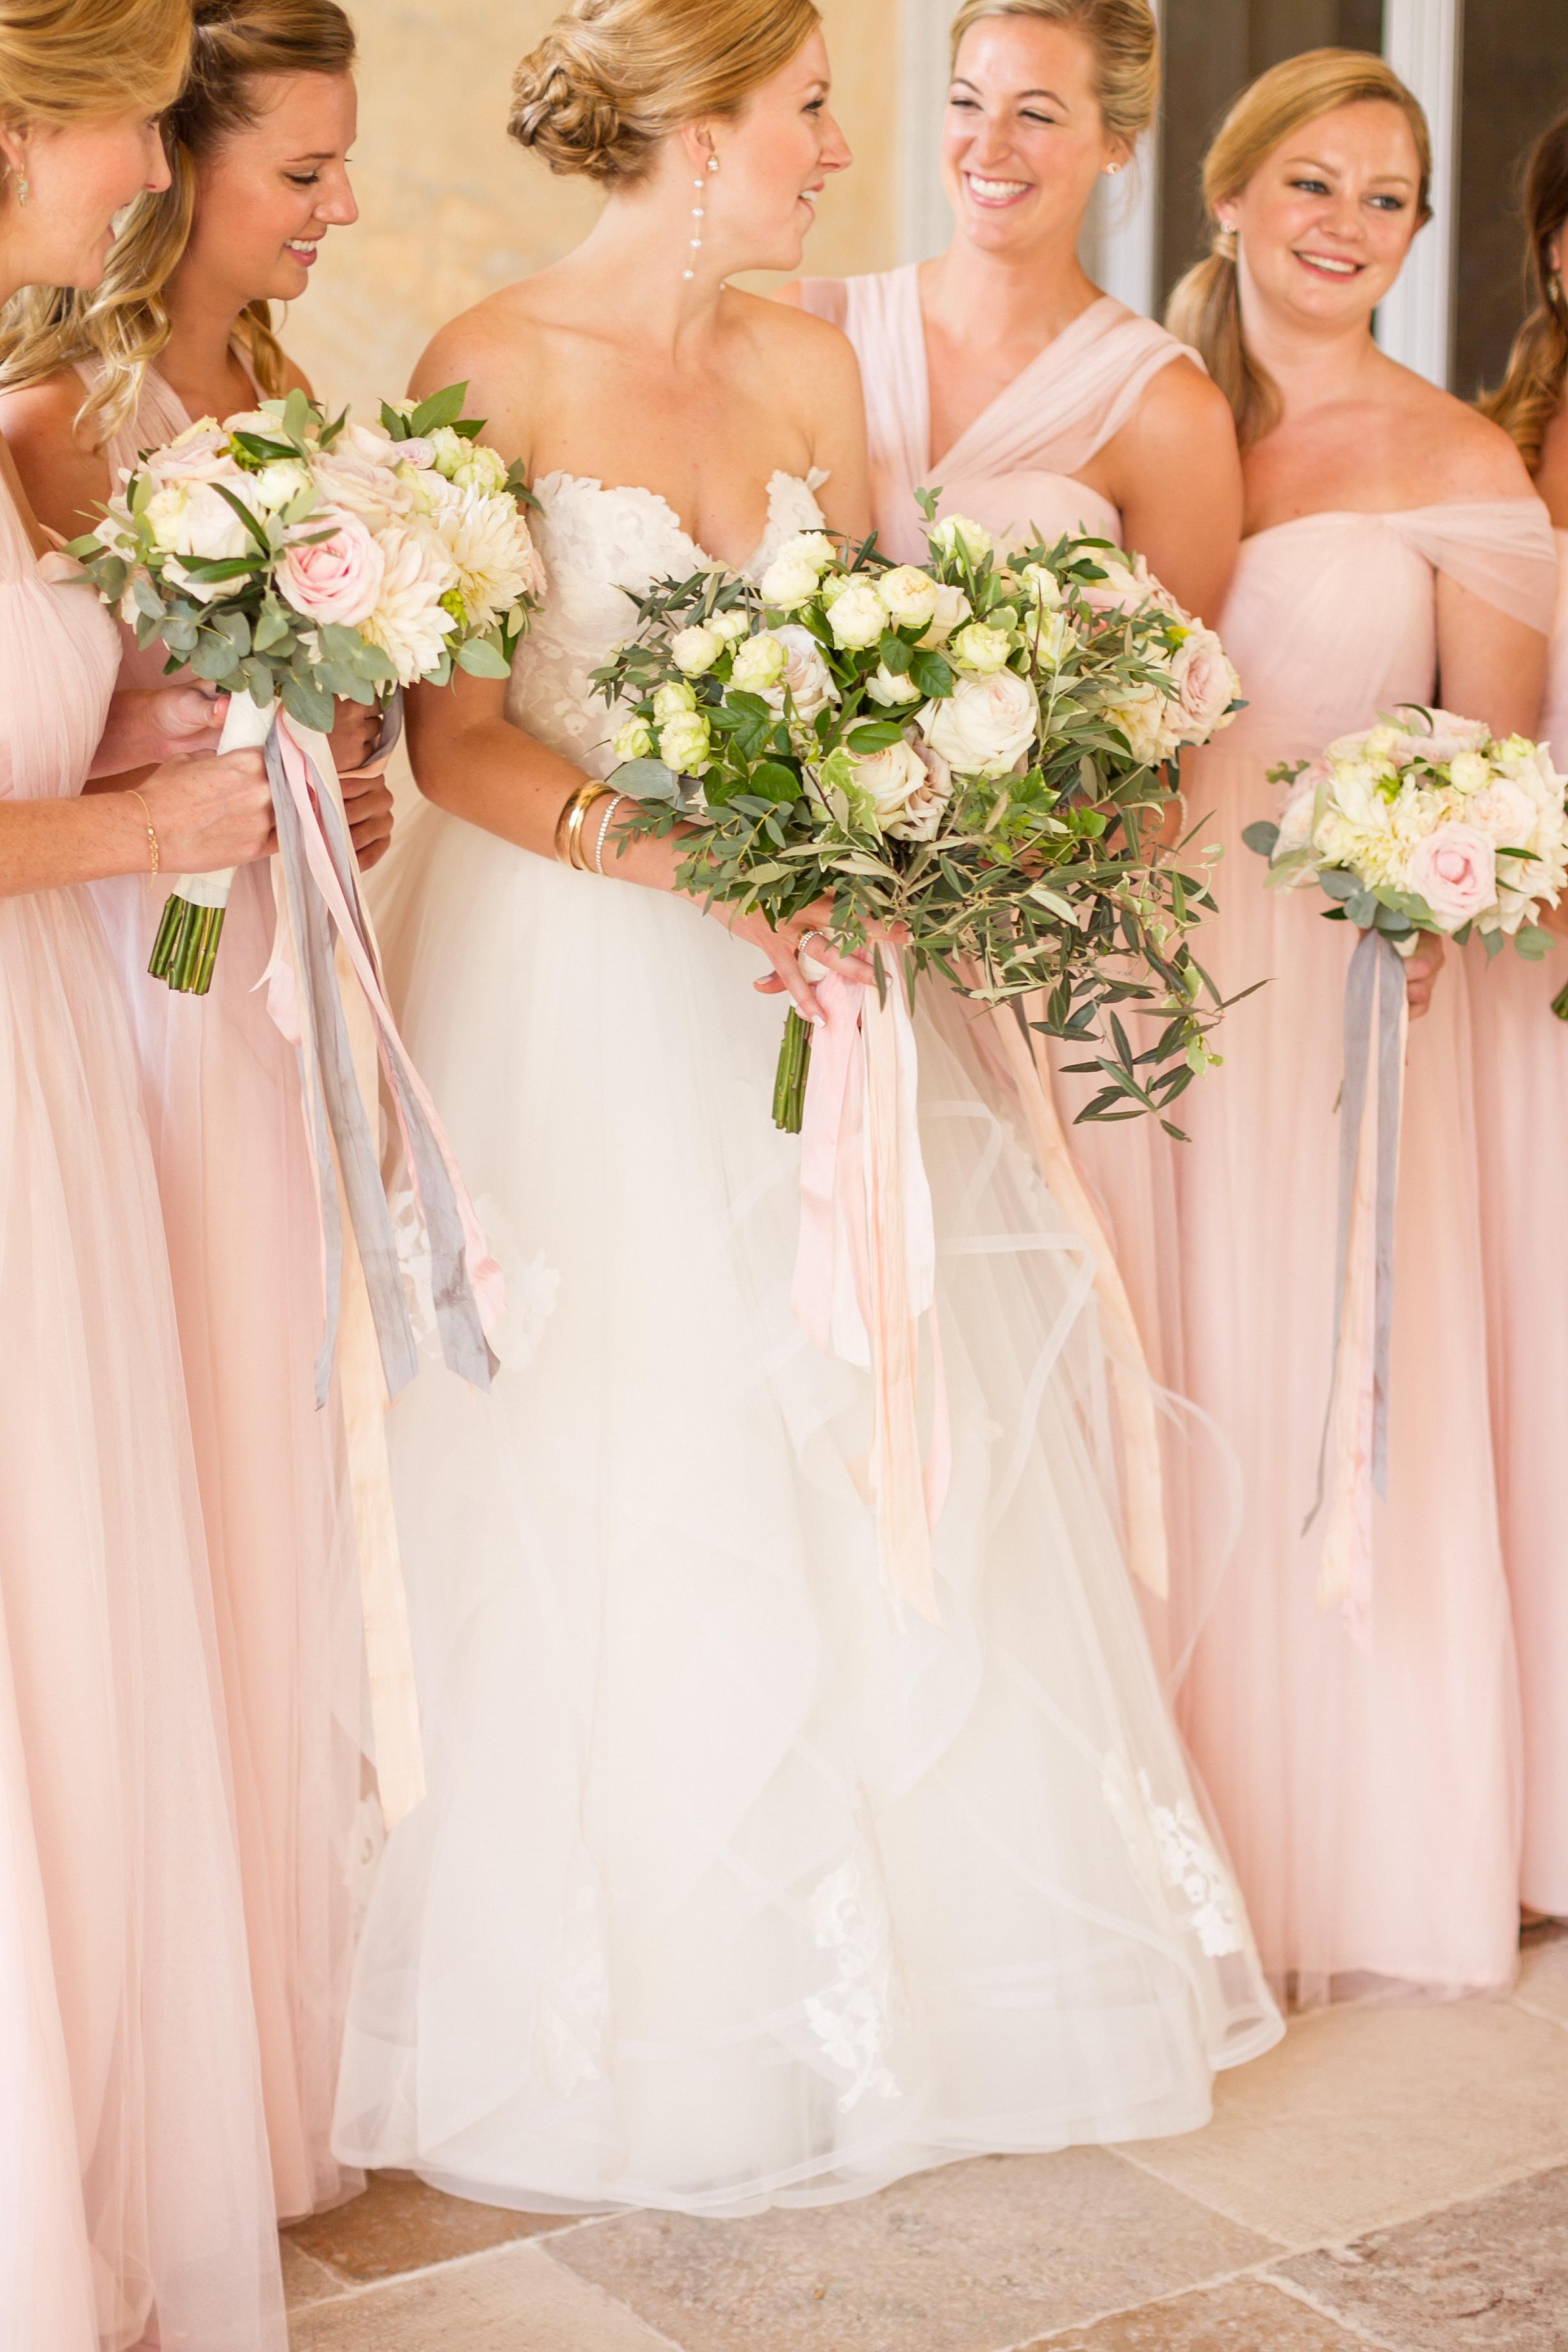 04_bridesmaids-0456.jpg